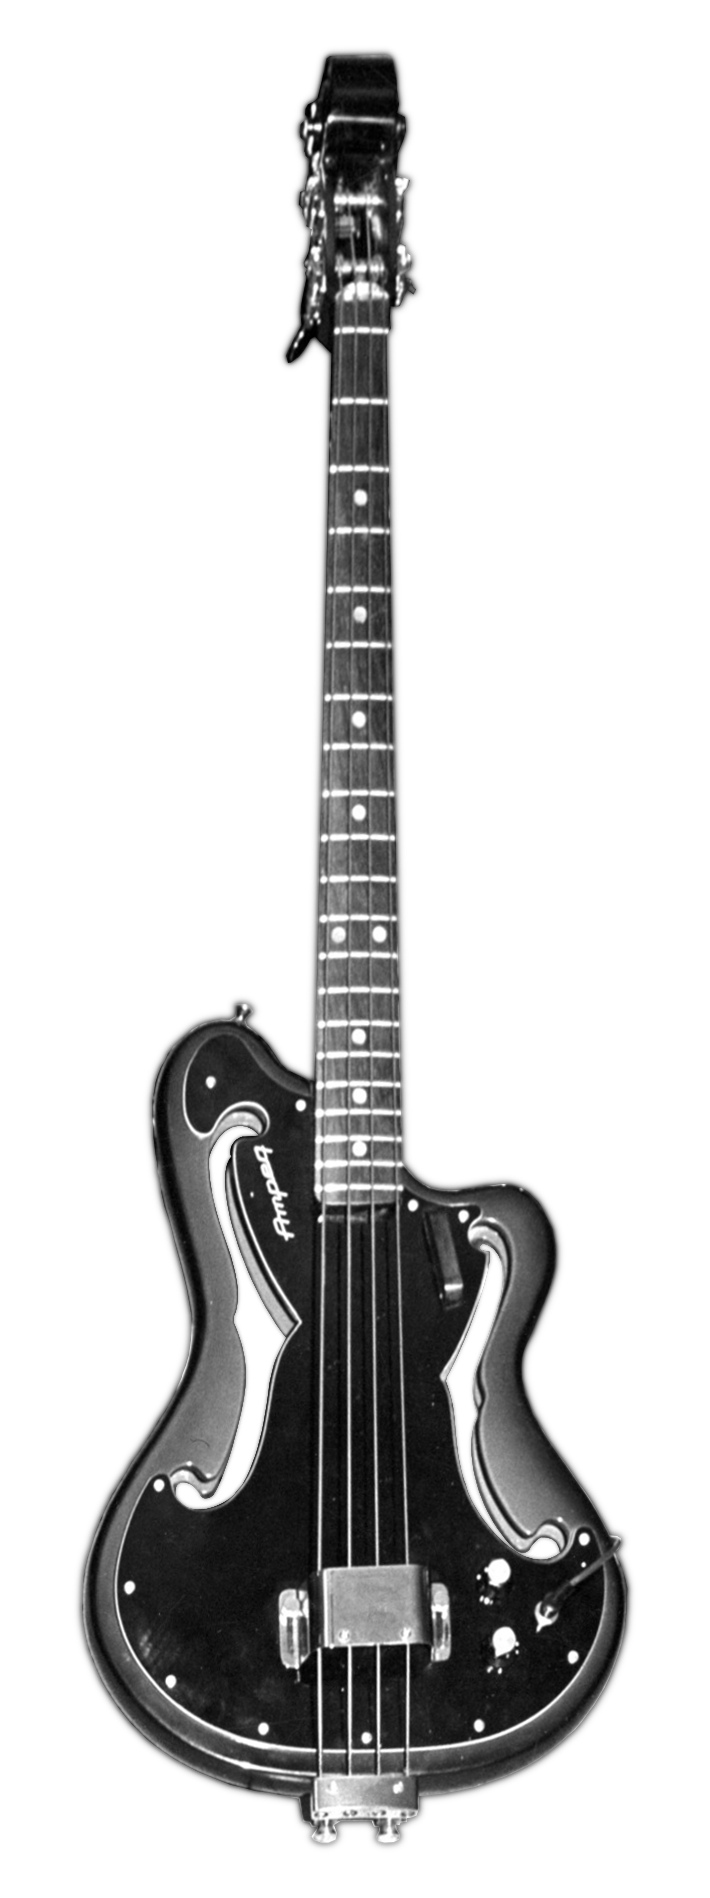 Ampeg AEB-1 Horizontal Bass.jpg